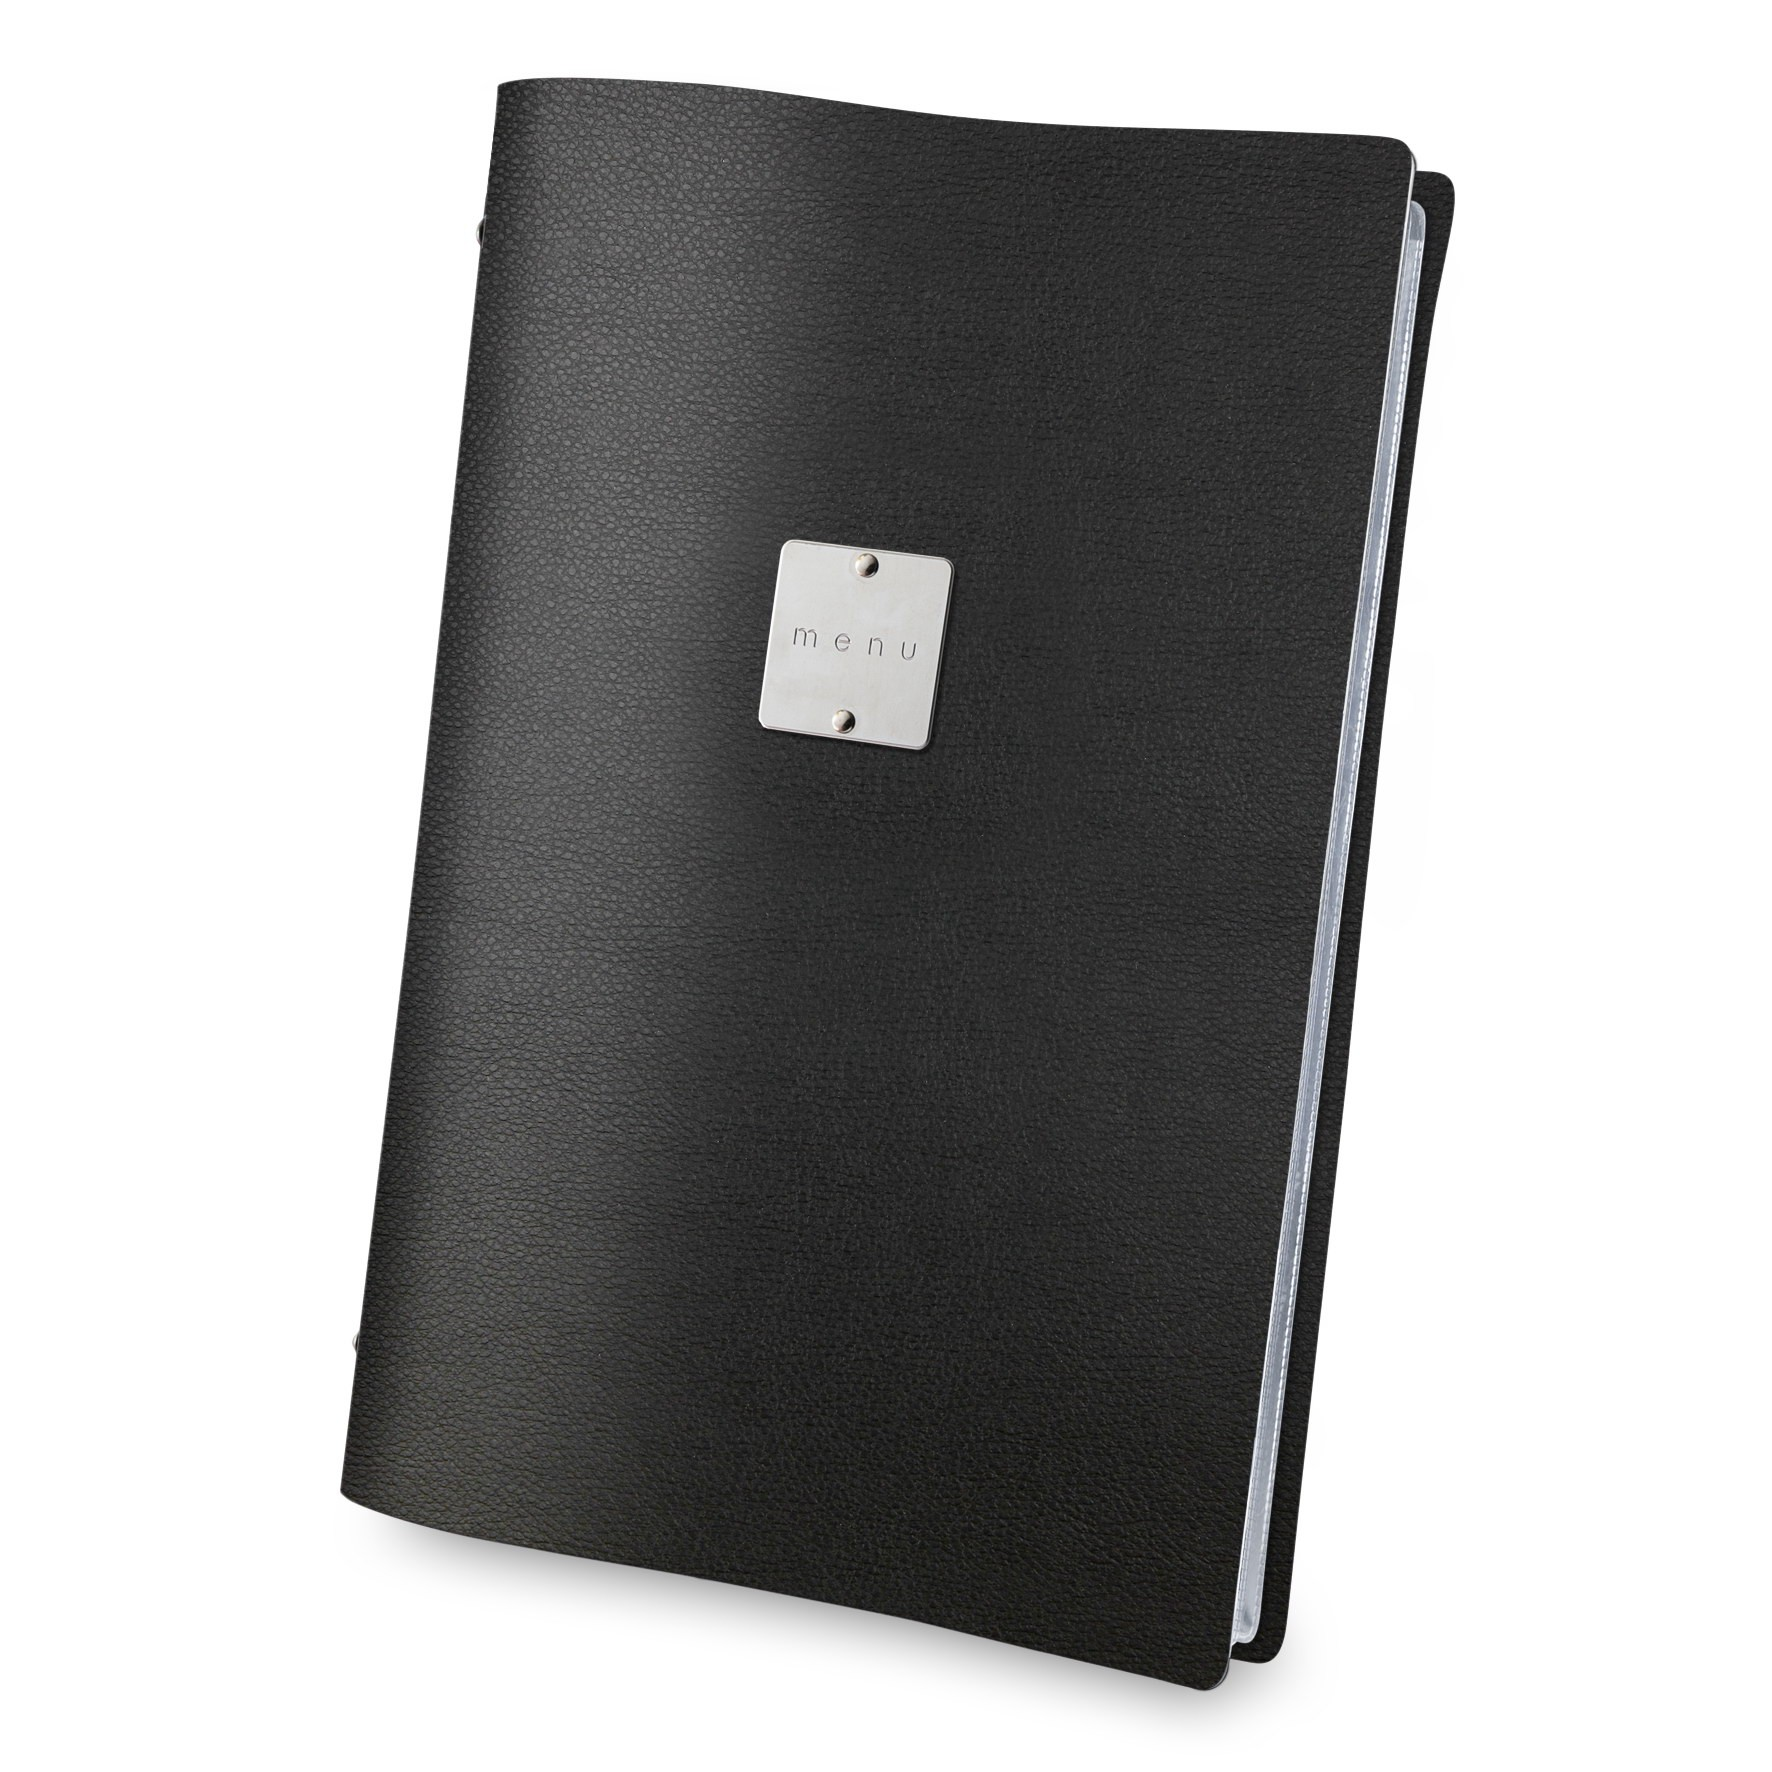 Protège-menu PVC classic noir